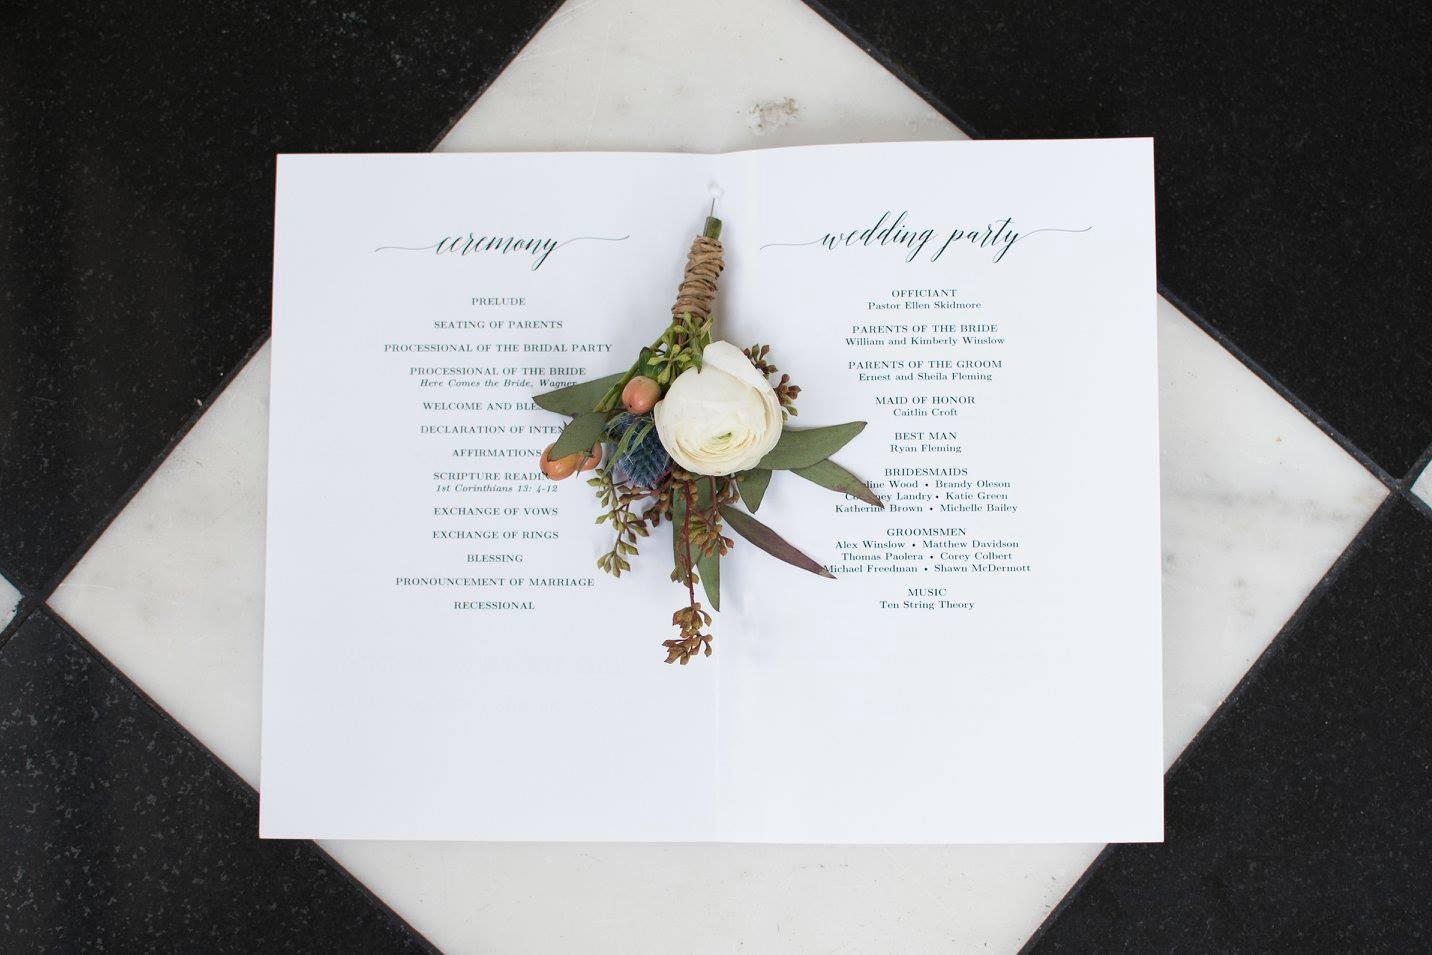 Detail shot of wedding ceremony program captured by Soussou Productions